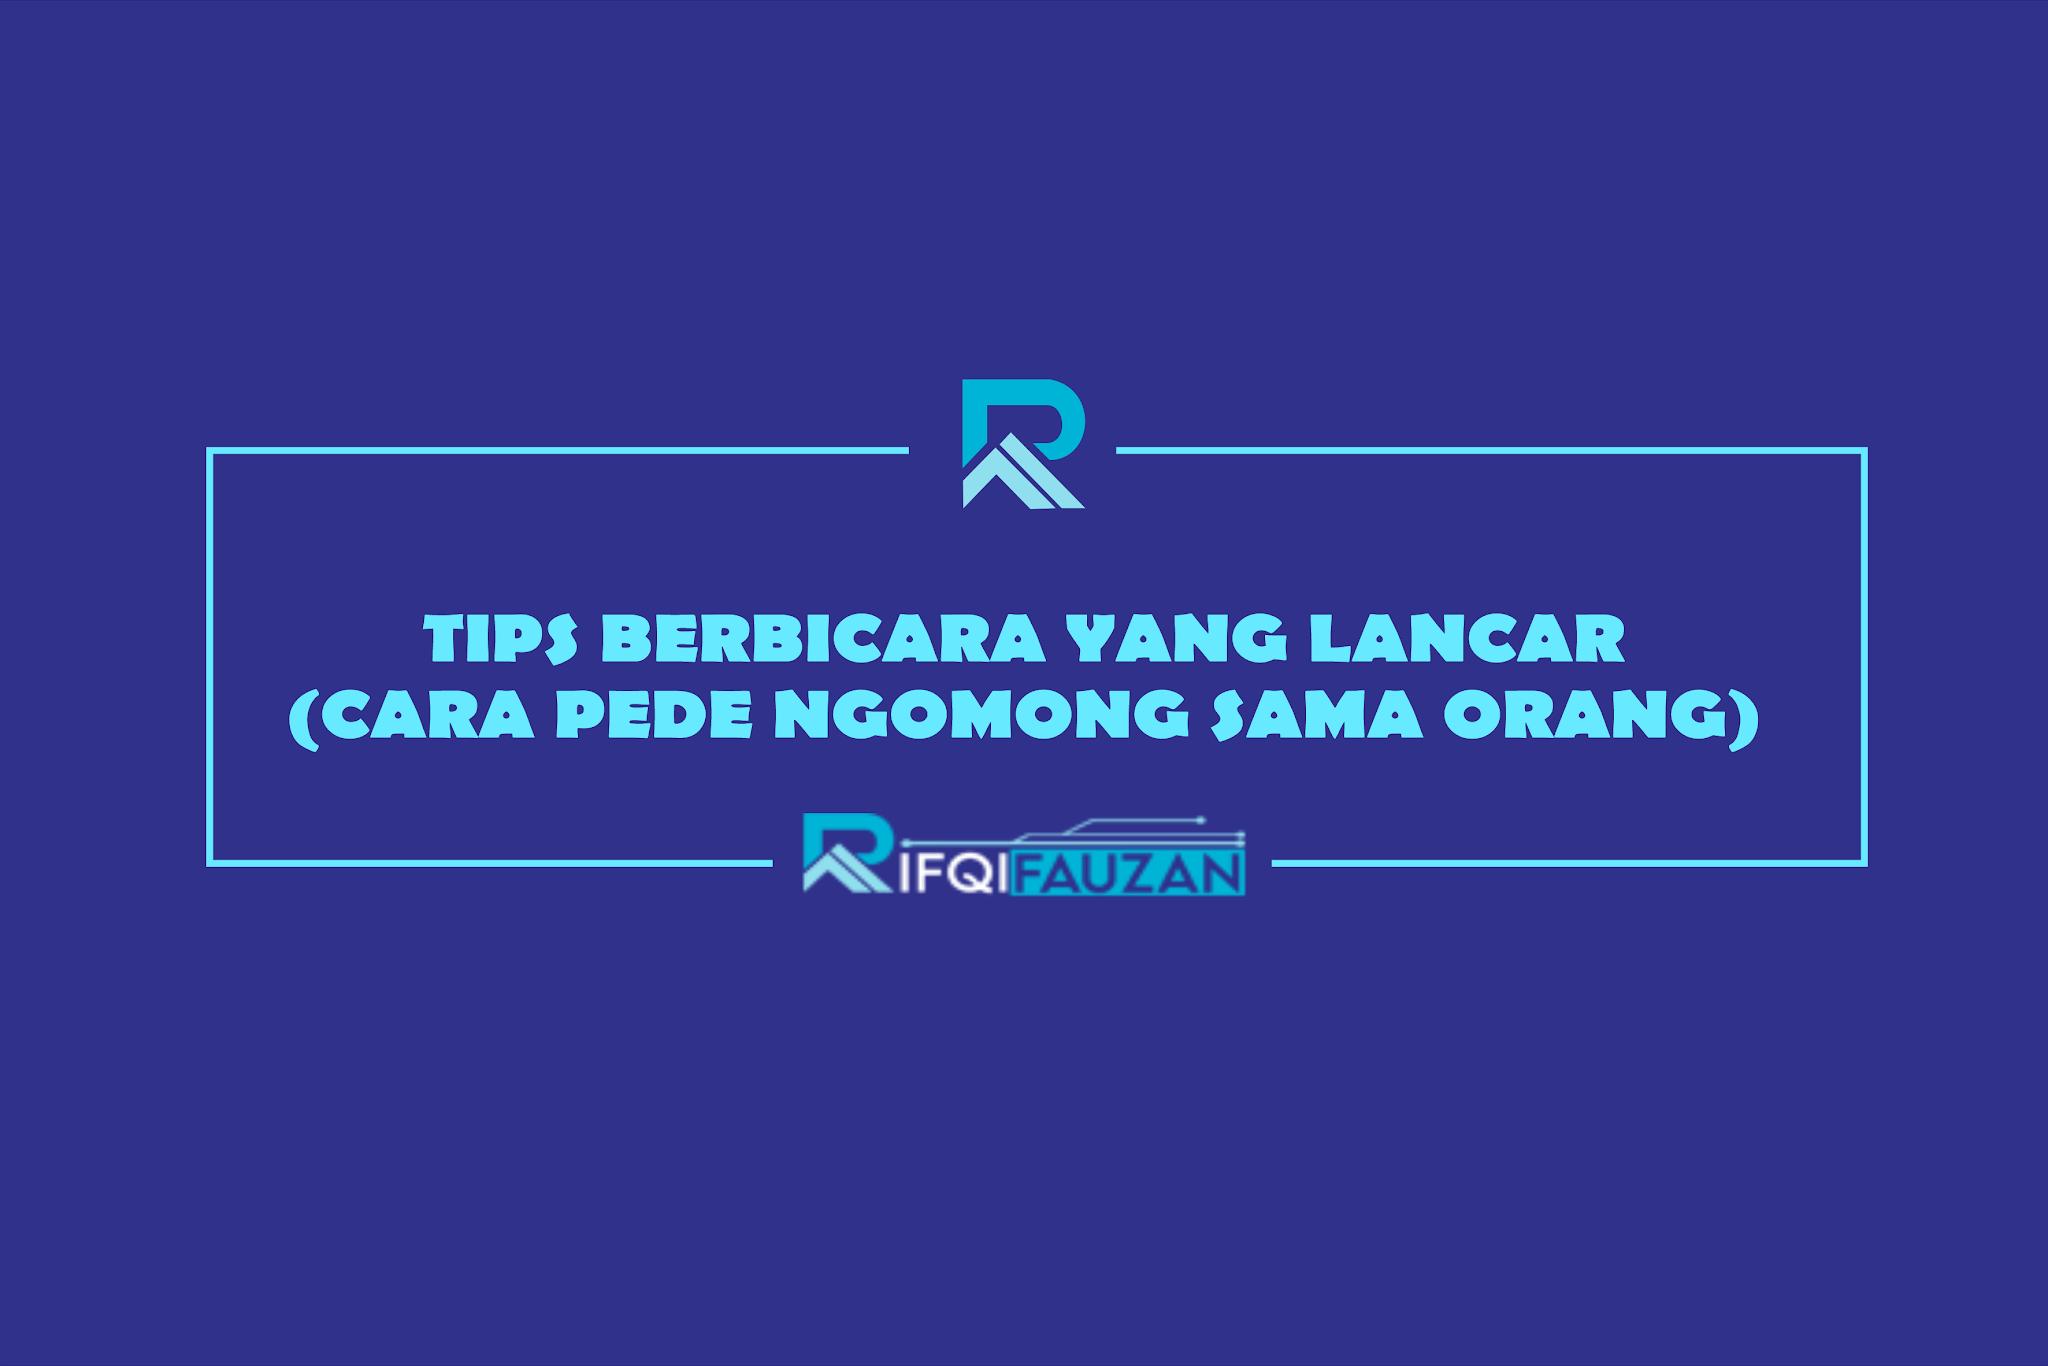 TIPS BERBICARA YANG LANCAR (CARA PEDE NGOMONG SAMA ORANG)